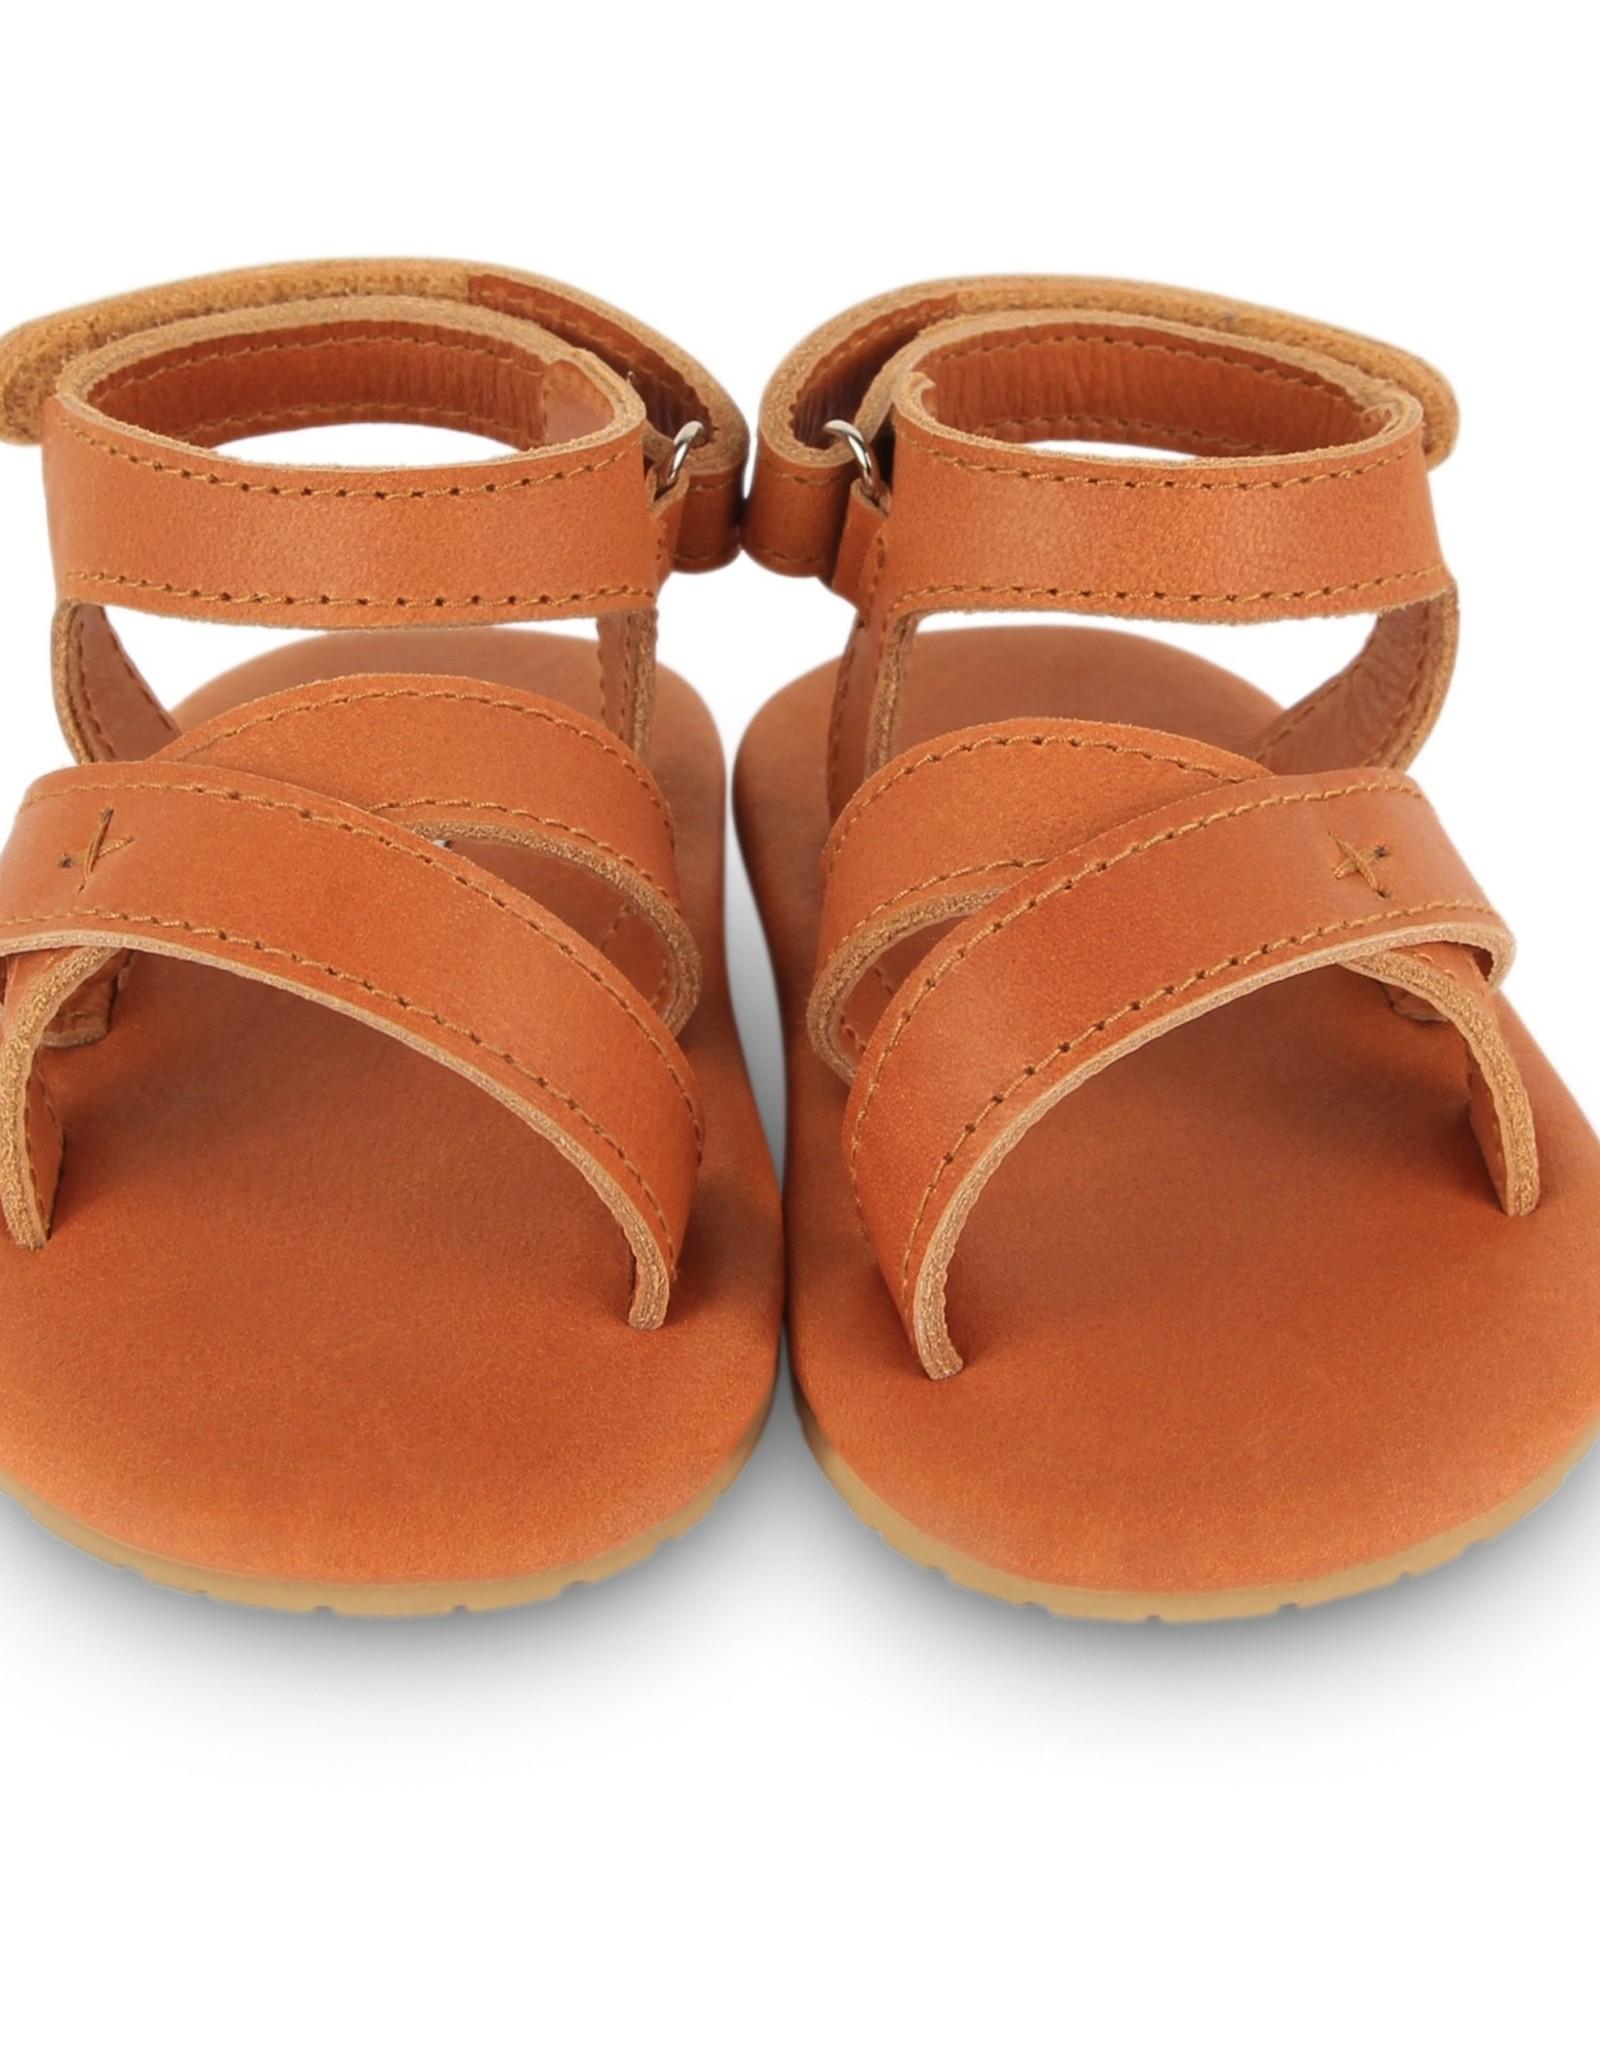 Donsje Giggles Sandals